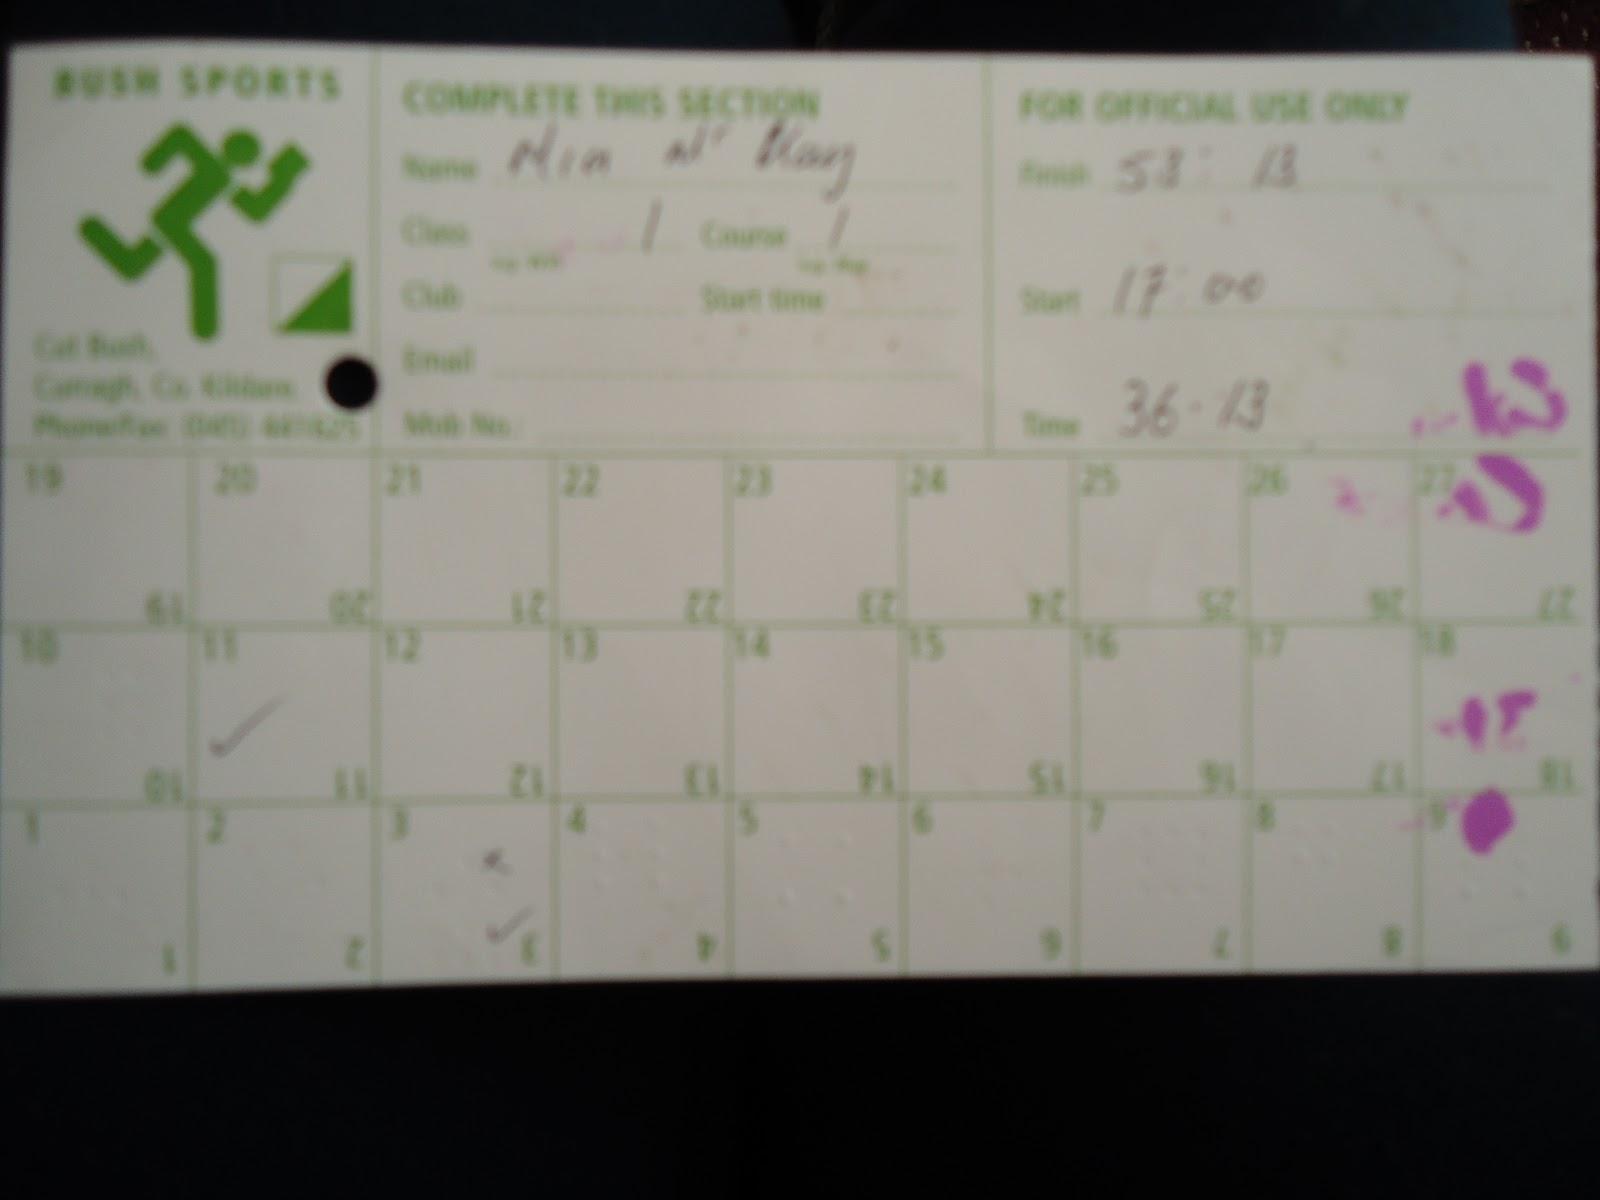 Download orienteering punch card template centrizius for Orienteering control card template